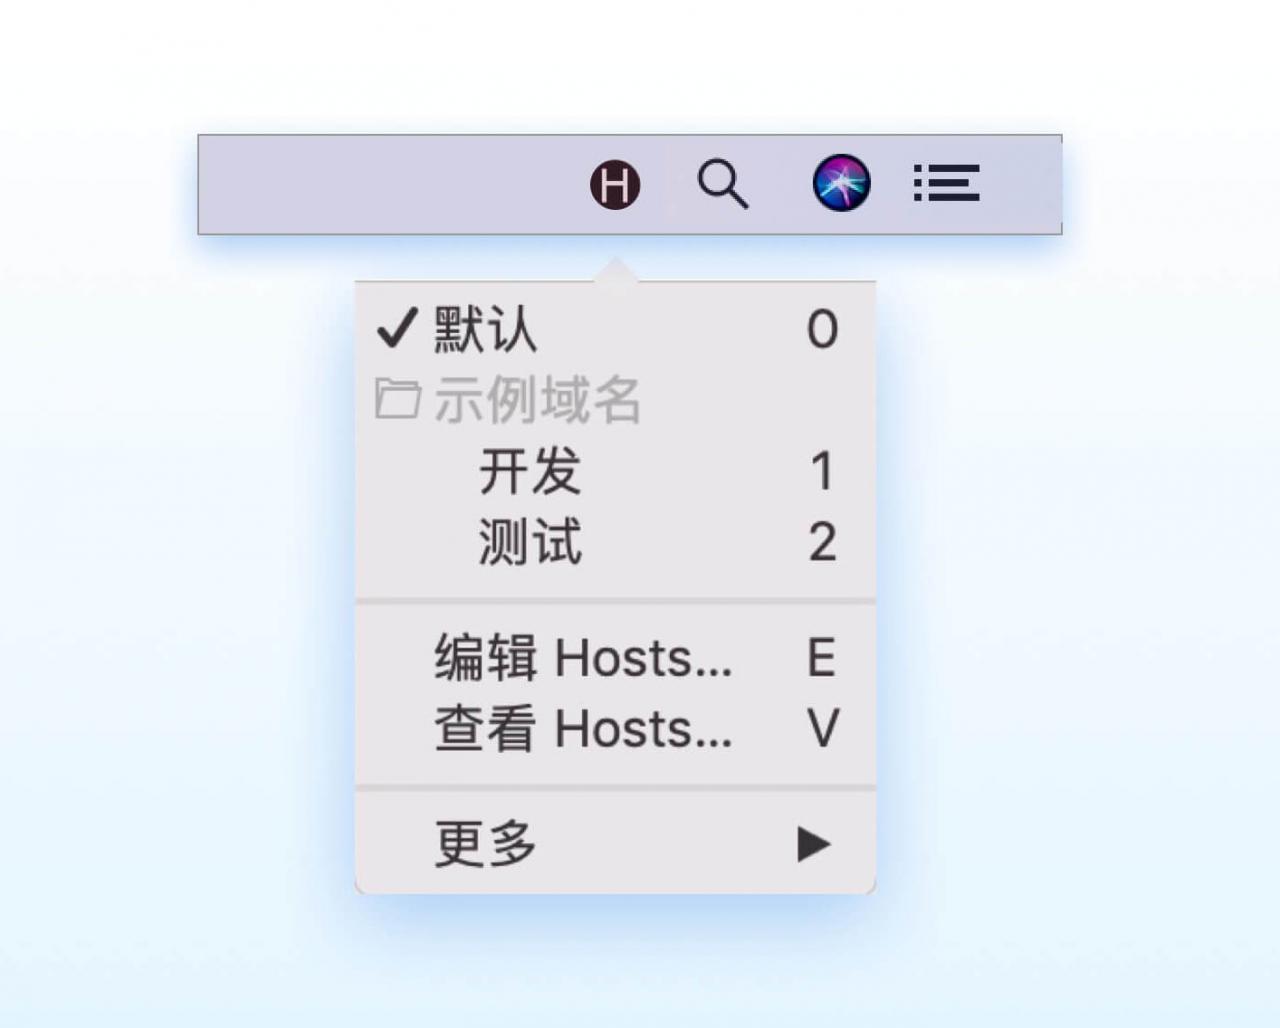 iHosts 一款MAC上修改hosts文件的软件-A17主机网